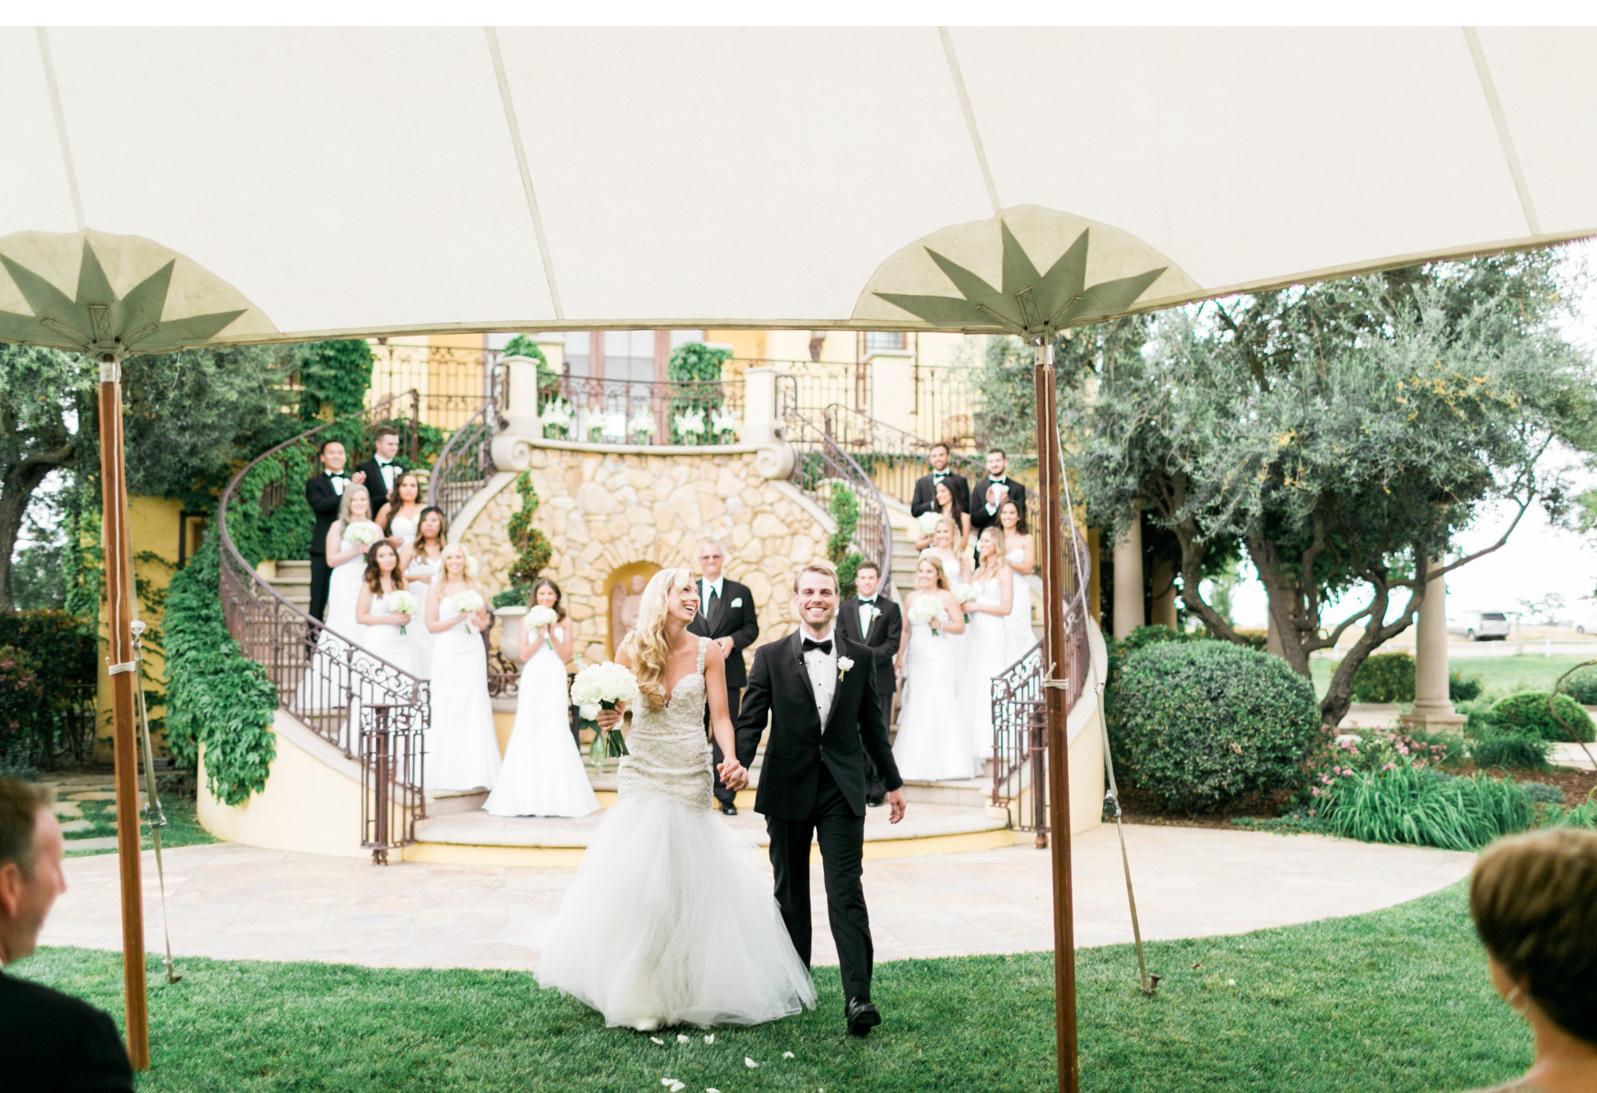 Southern-California-Wedding-Photographer-Natalie-Schutt-Photography_27.jpg